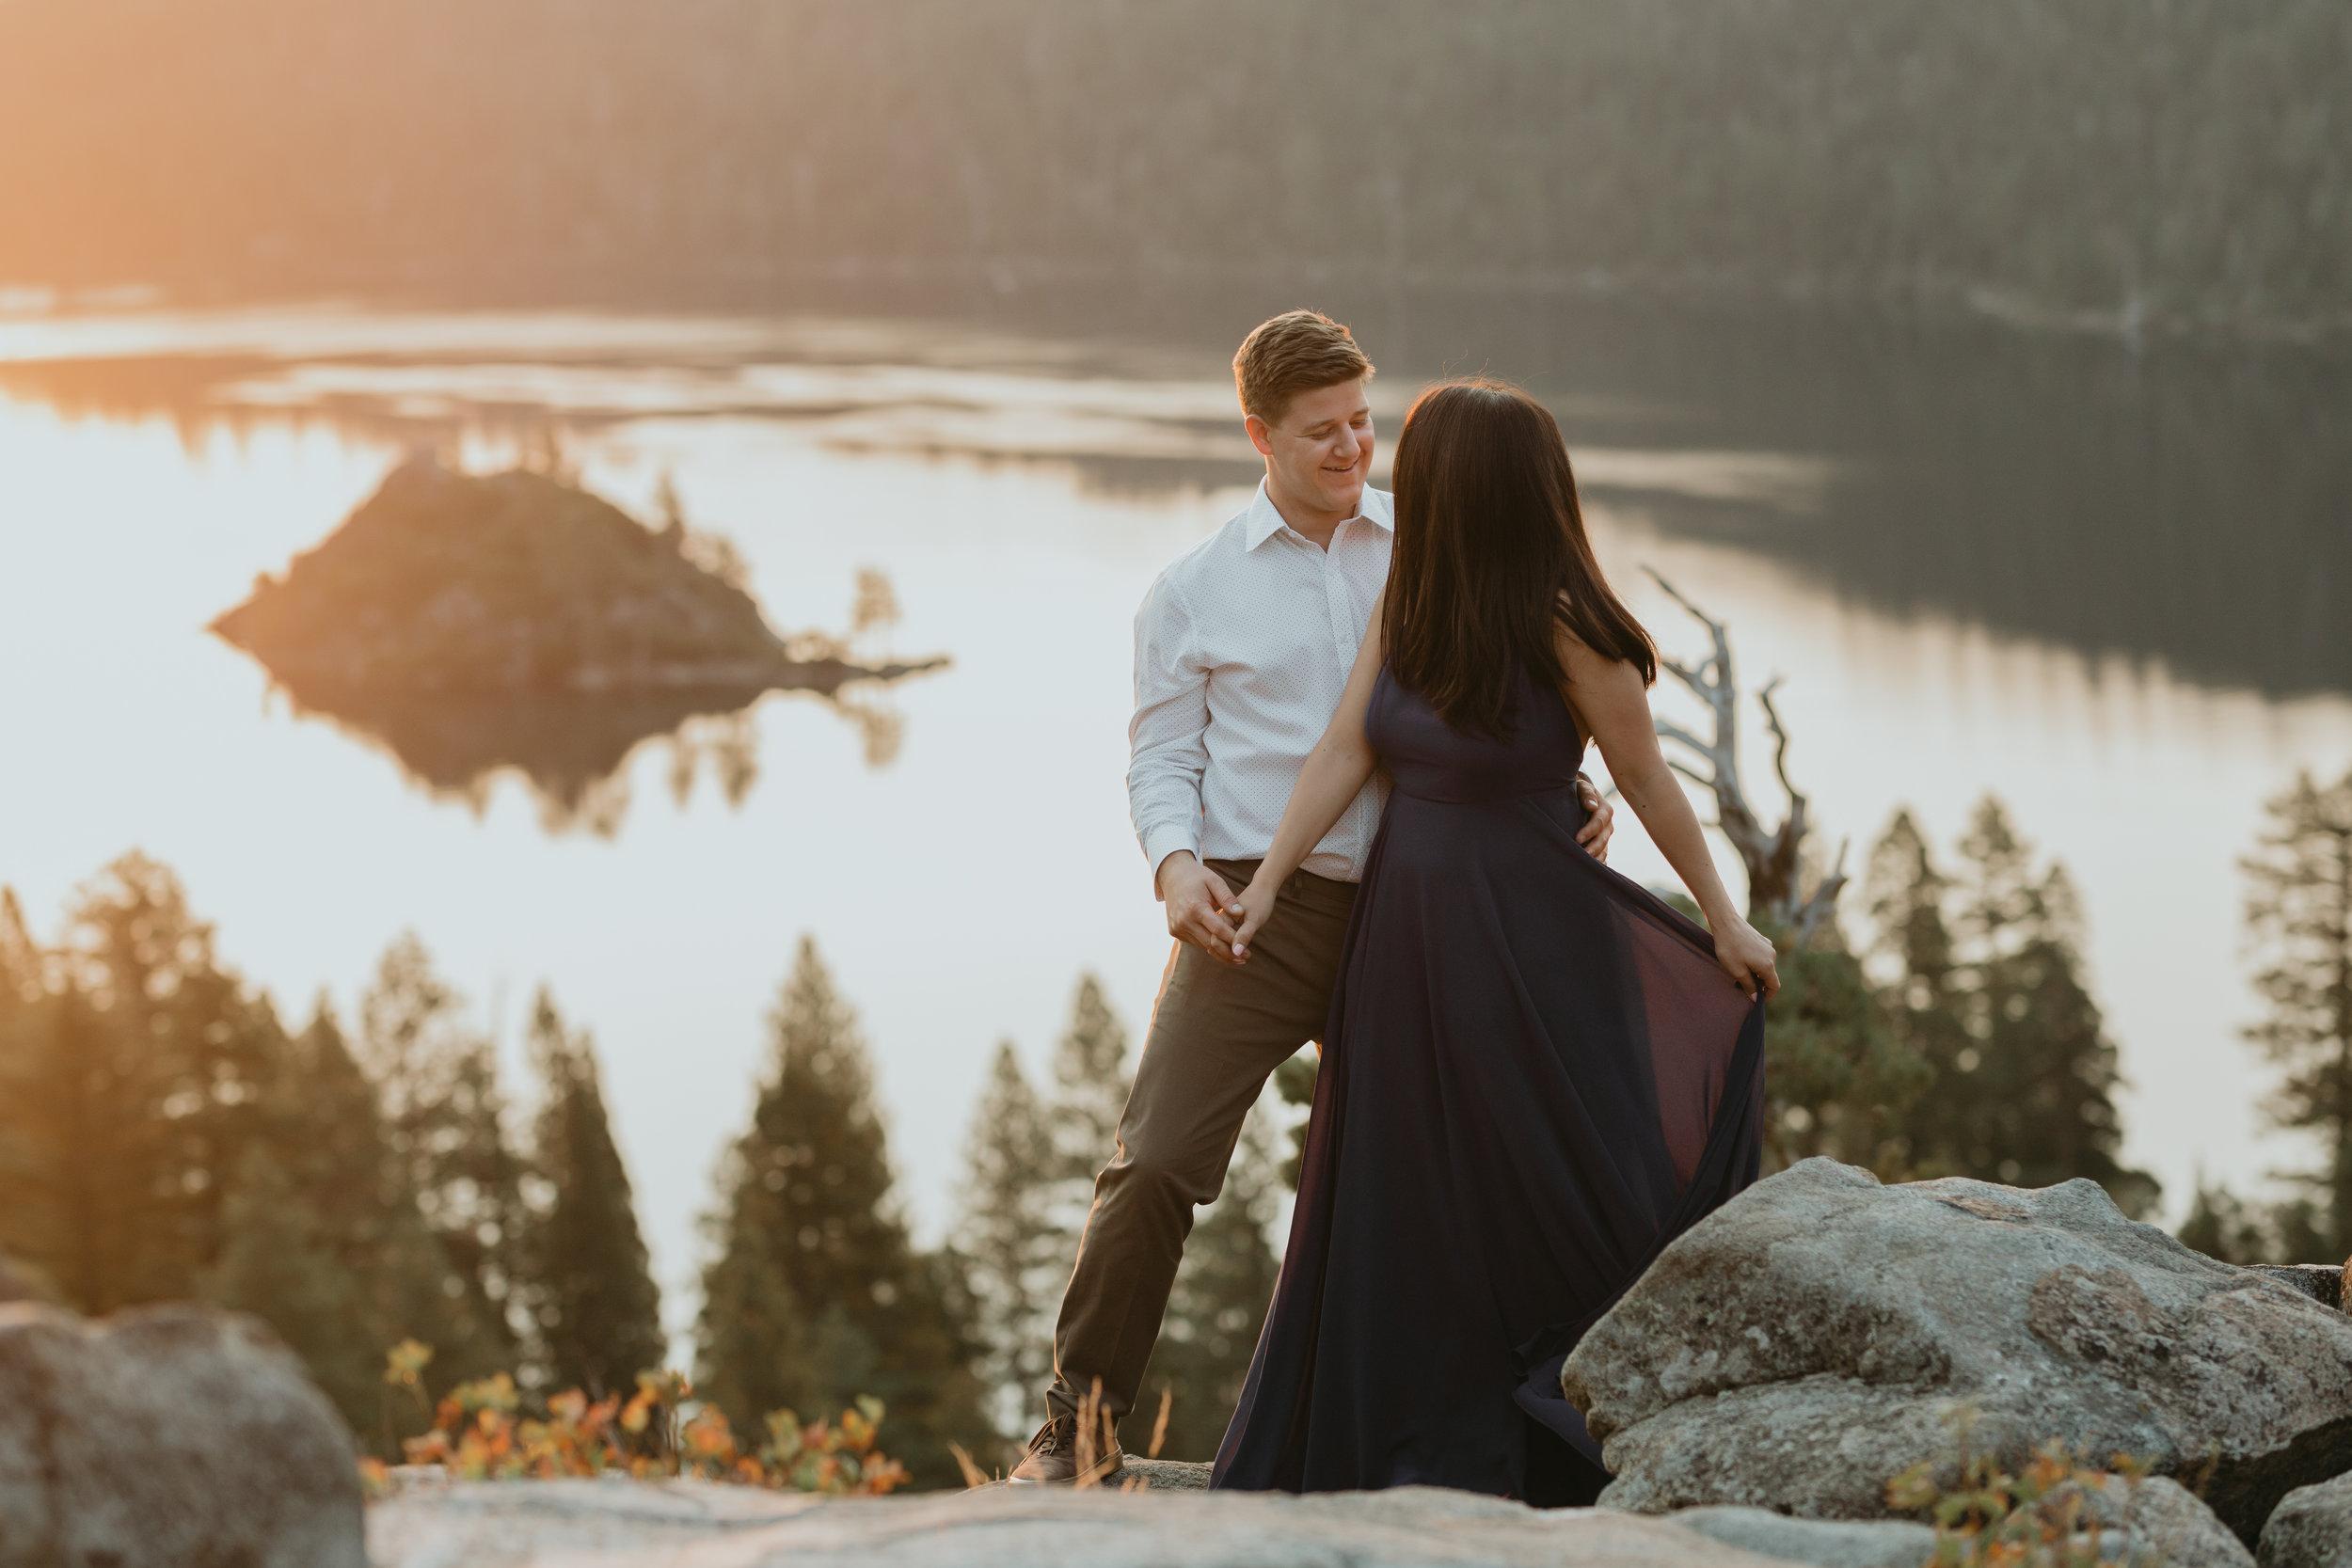 nicole-daacke-photography-lake-tahoe-sunrise-summer-adventure-engagement-photos-nevada-wedding-elopement-photographer-golden-emerald-bay-light-pine-trees-summer-vibe-fun-carefree-authentic-love-16.jpg